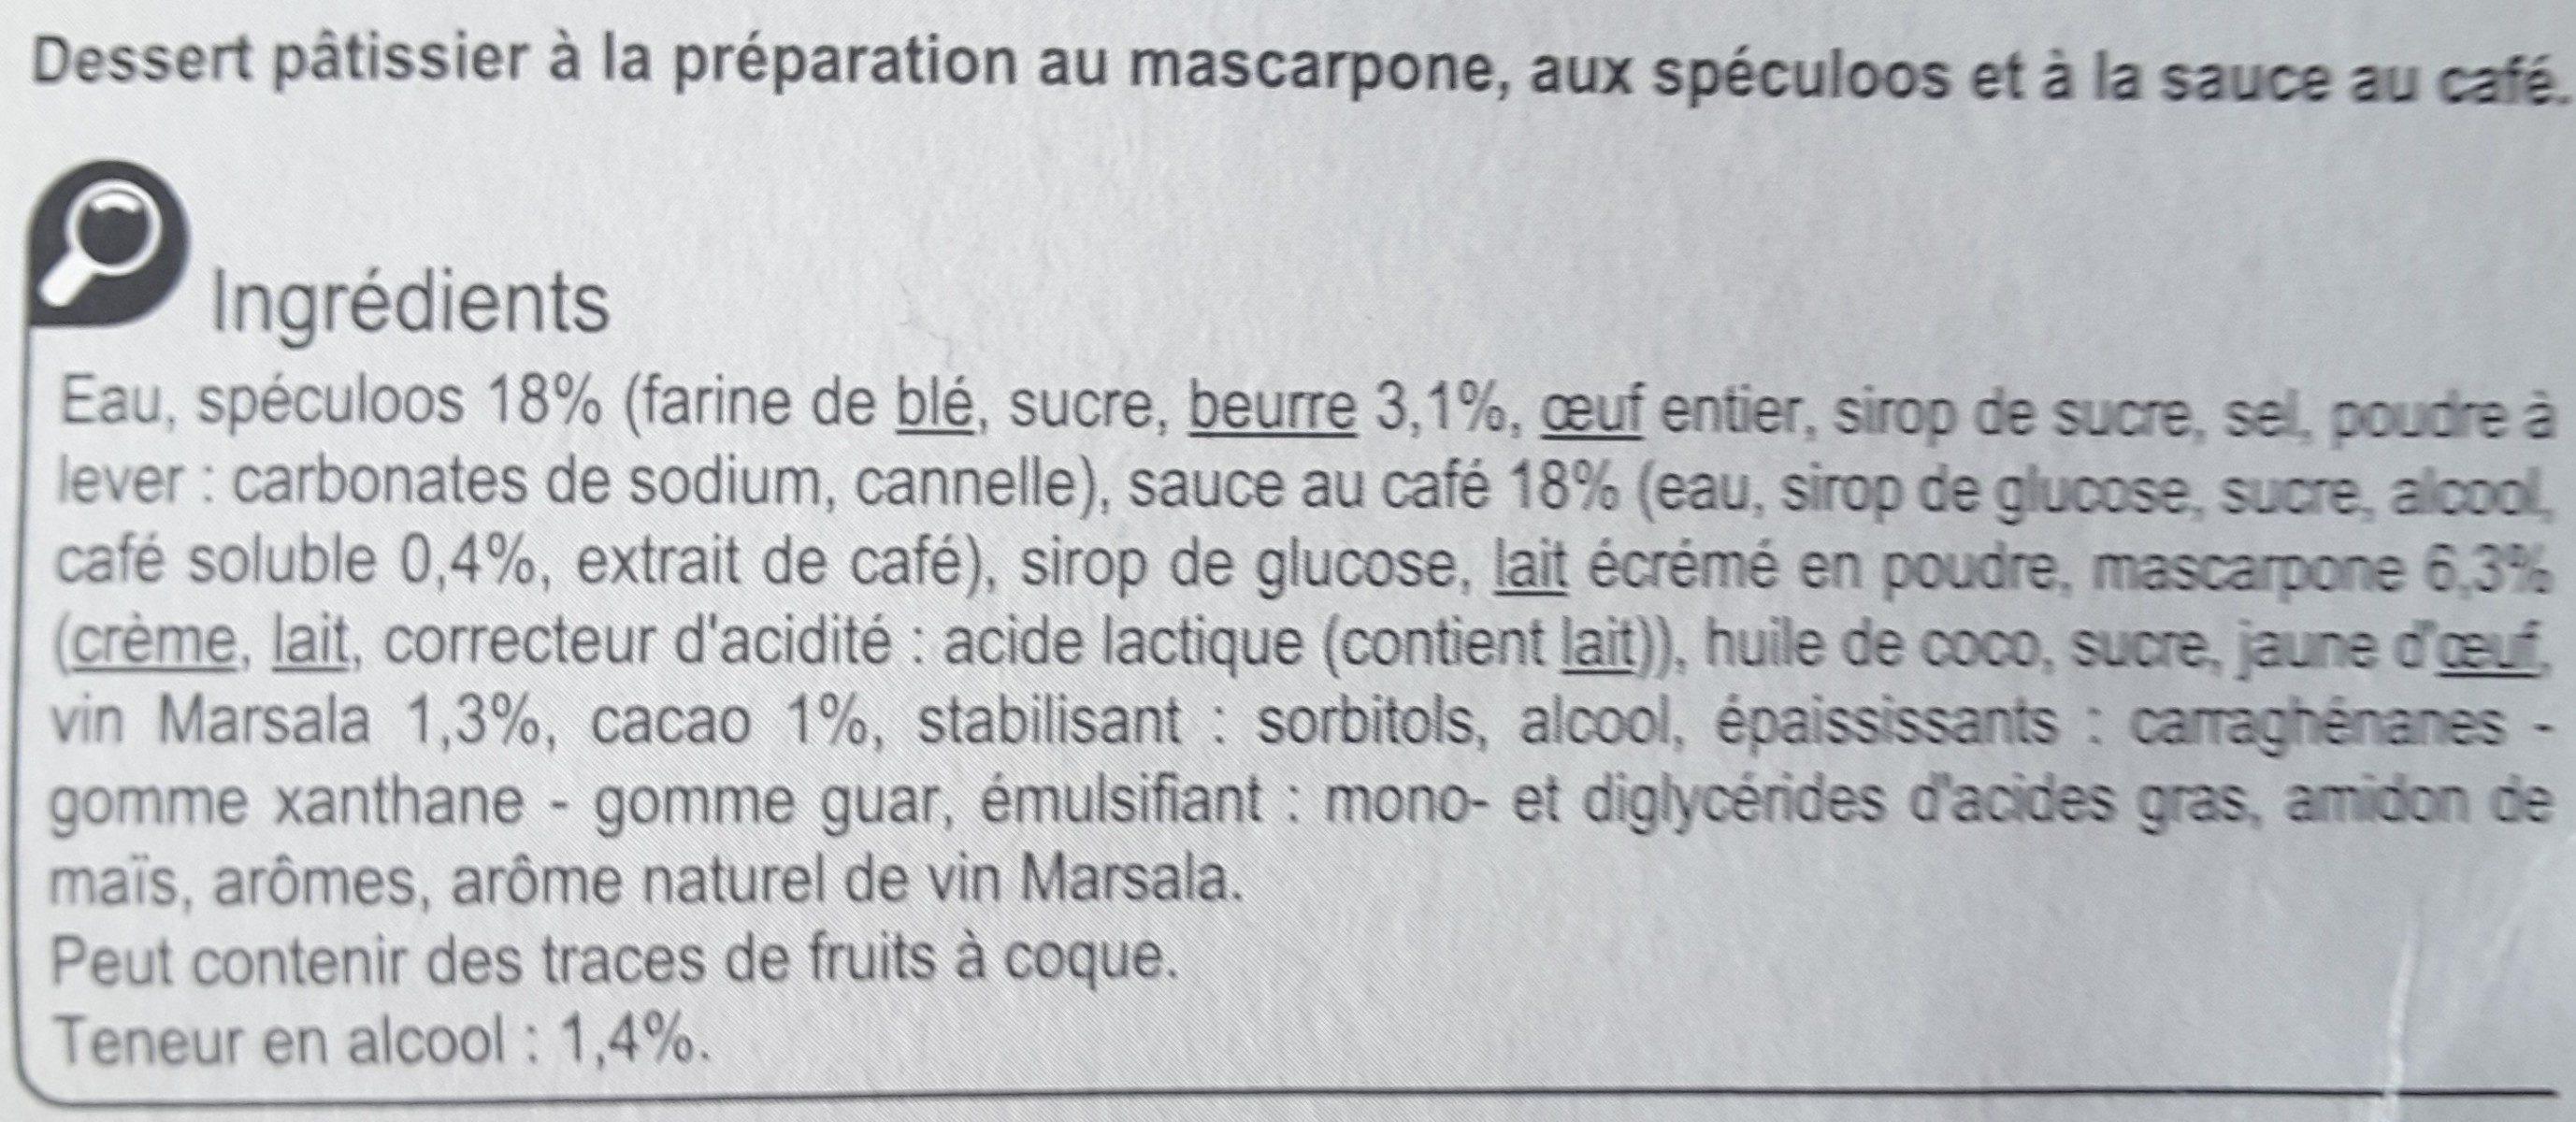 Tiramisu aux Speculoos - Ingredienti - fr